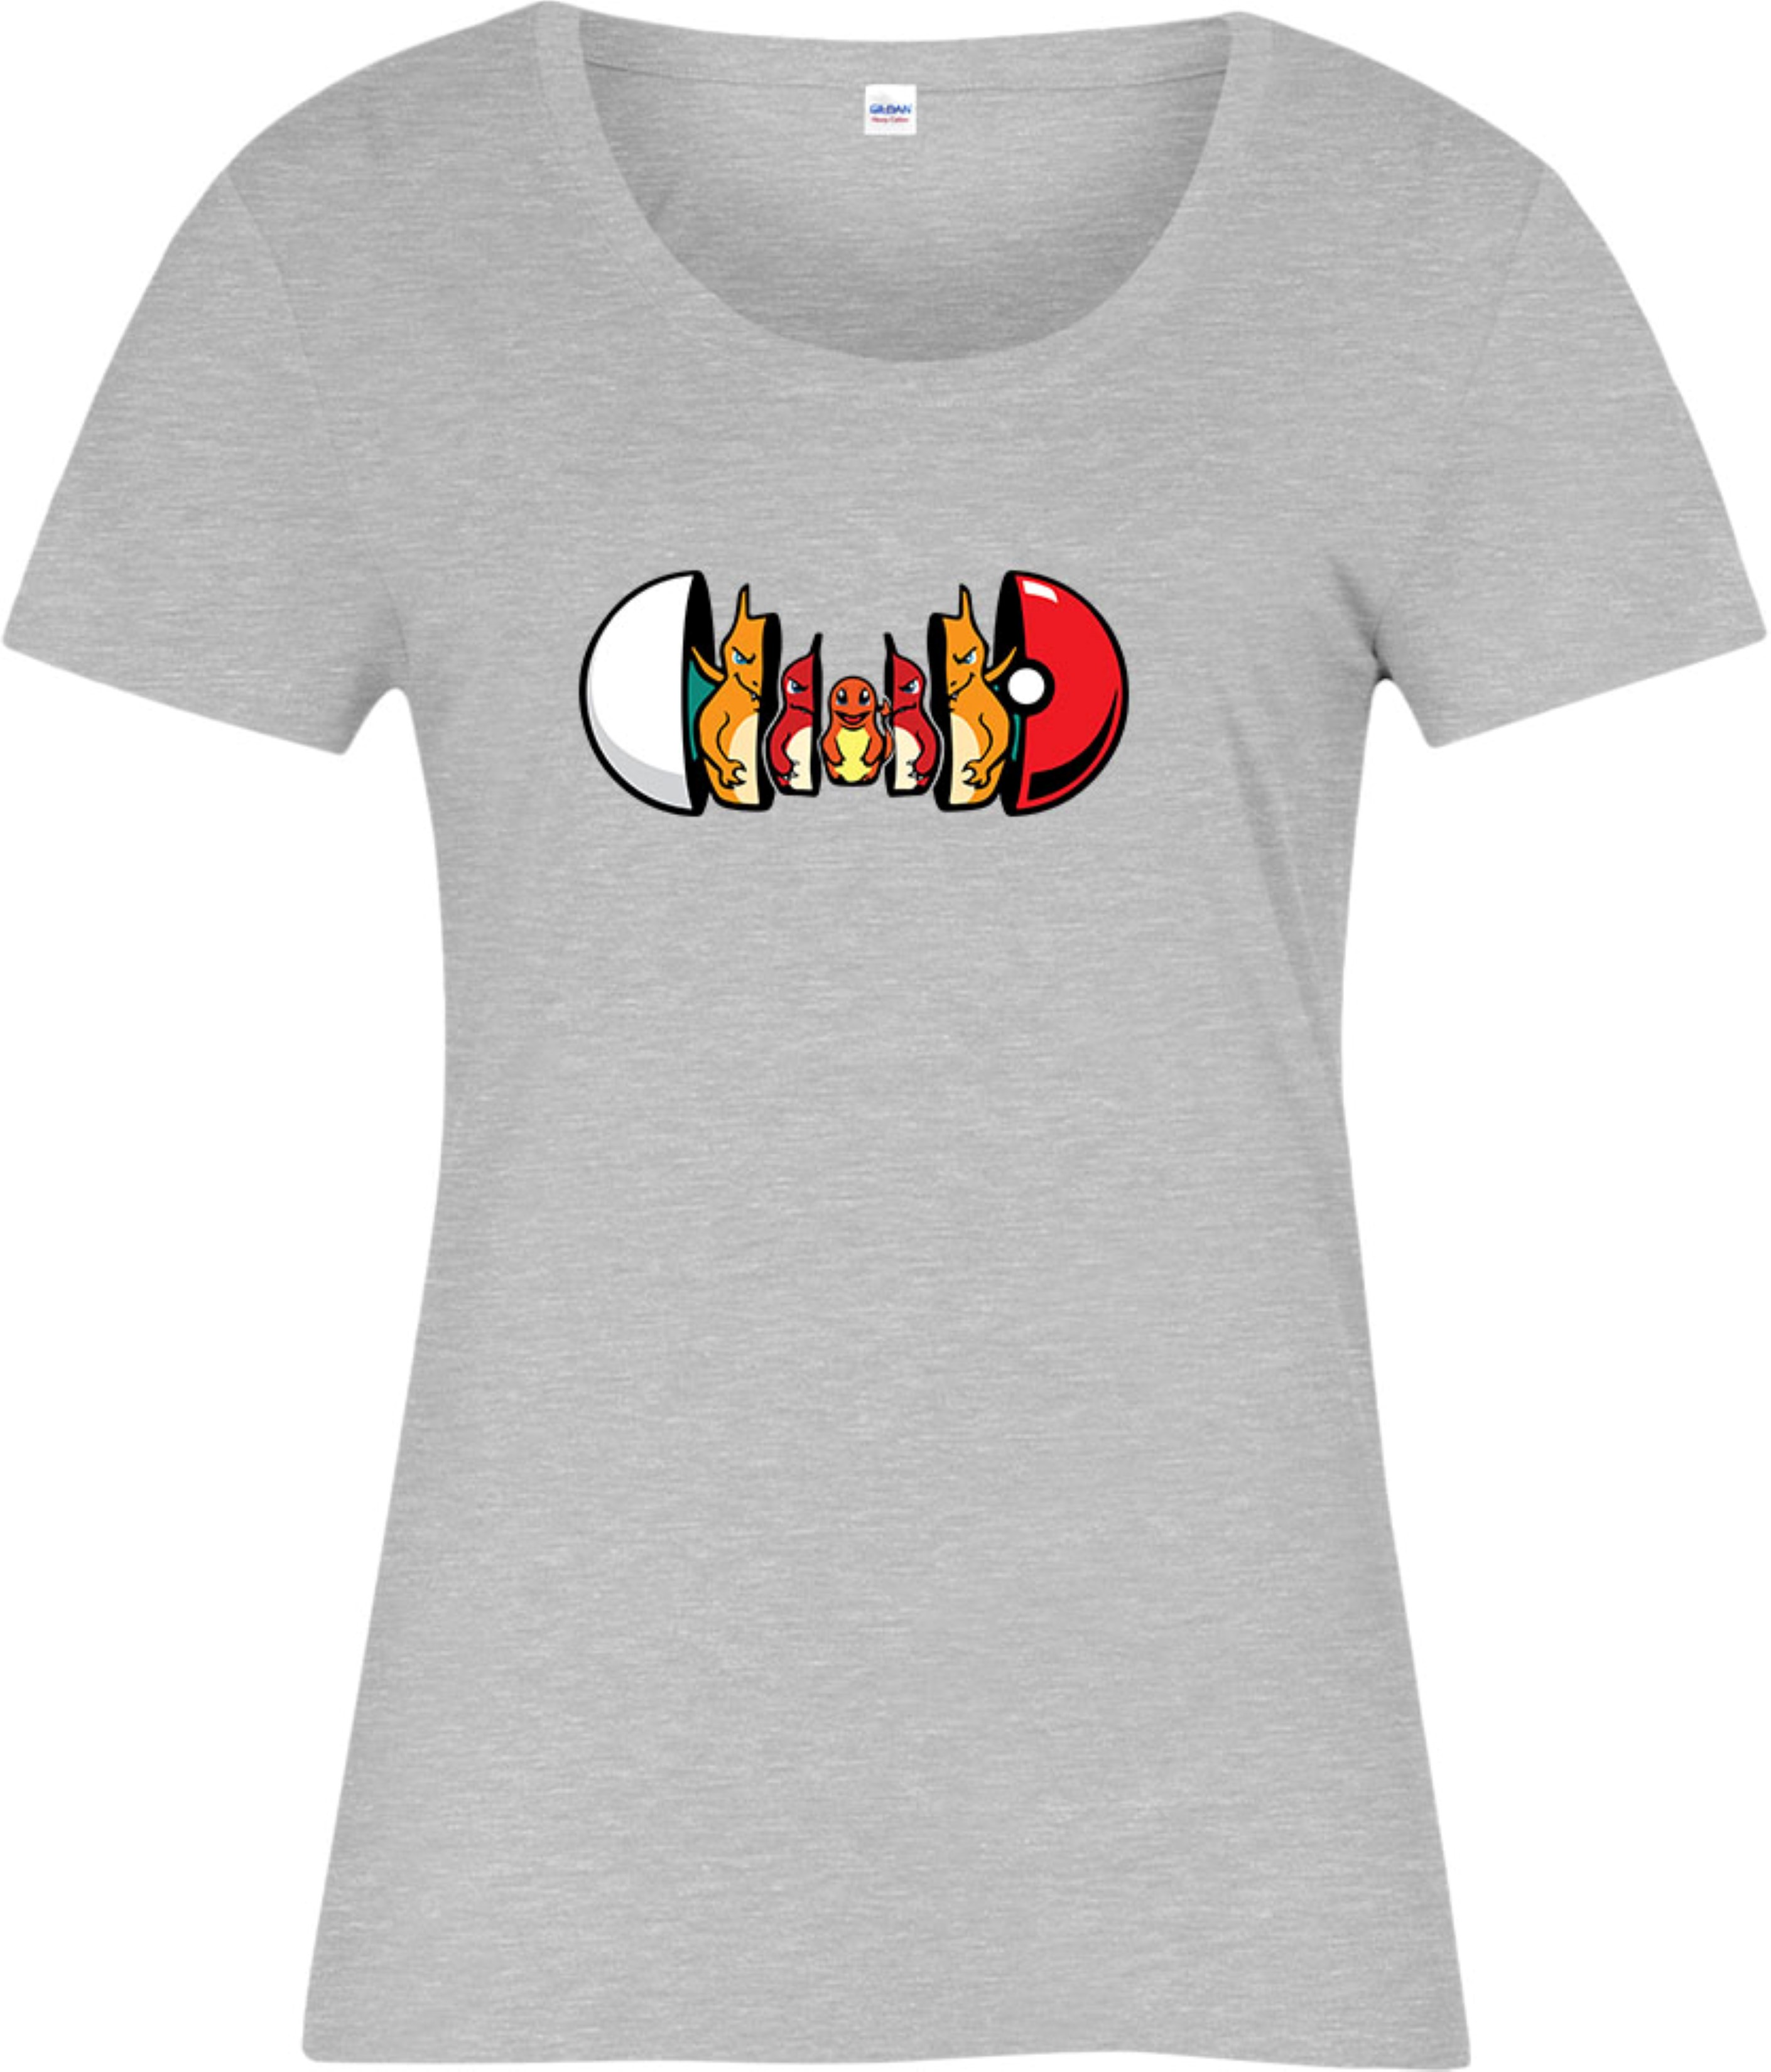 Pokemon Ladies T-shirt Charmander Forms Pokeball Ken Sugimori Top ...